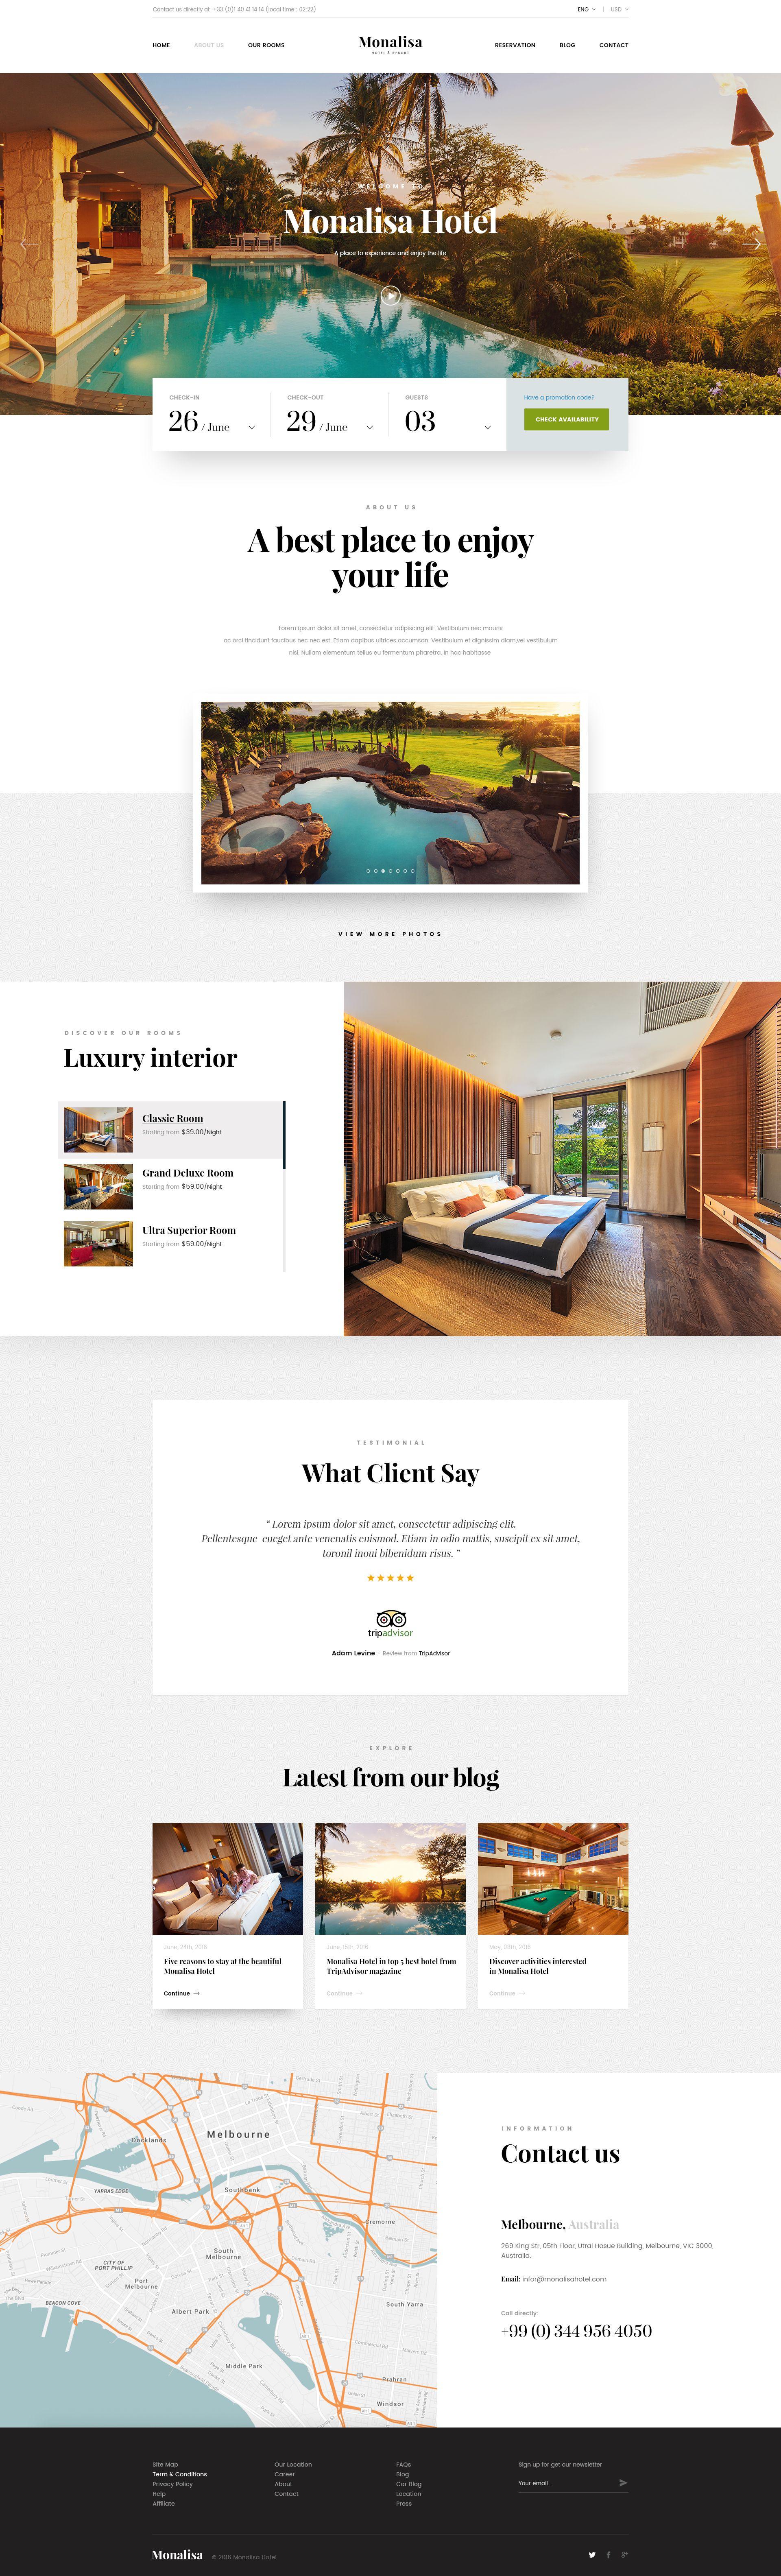 Monalisa Hotel Site Hotel Website Design Web Layout Design Layout Design